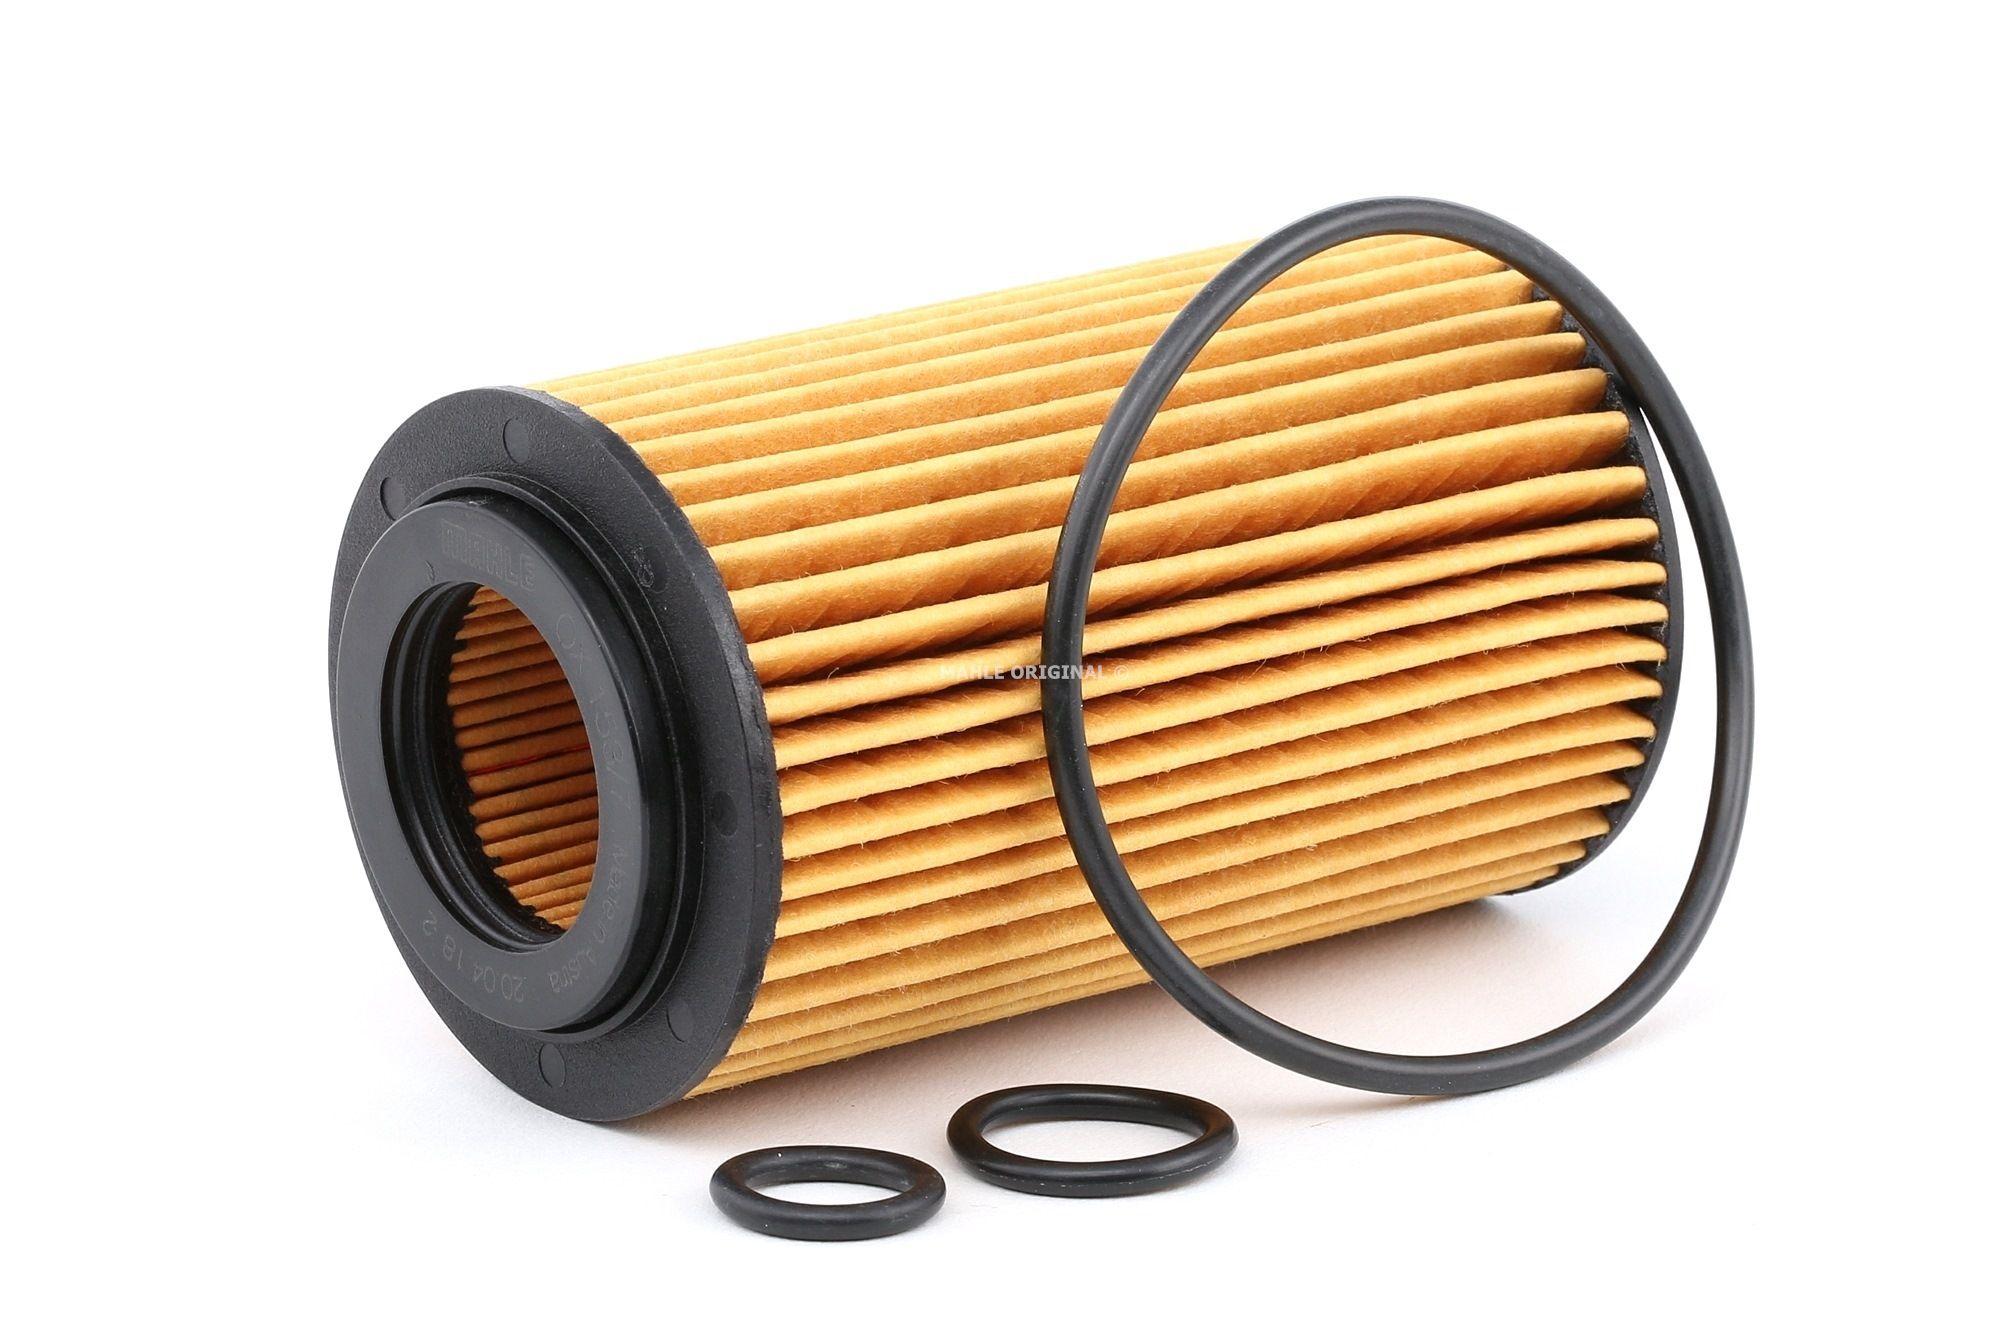 79922119 MAHLE ORIGINAL Filtereinsatz Innendurchmesser 2: 31mm, Ø: 64,3mm, Höhe: 115mm, Höhe 1: 105mm Ölfilter OX 153/7D2 kaufen